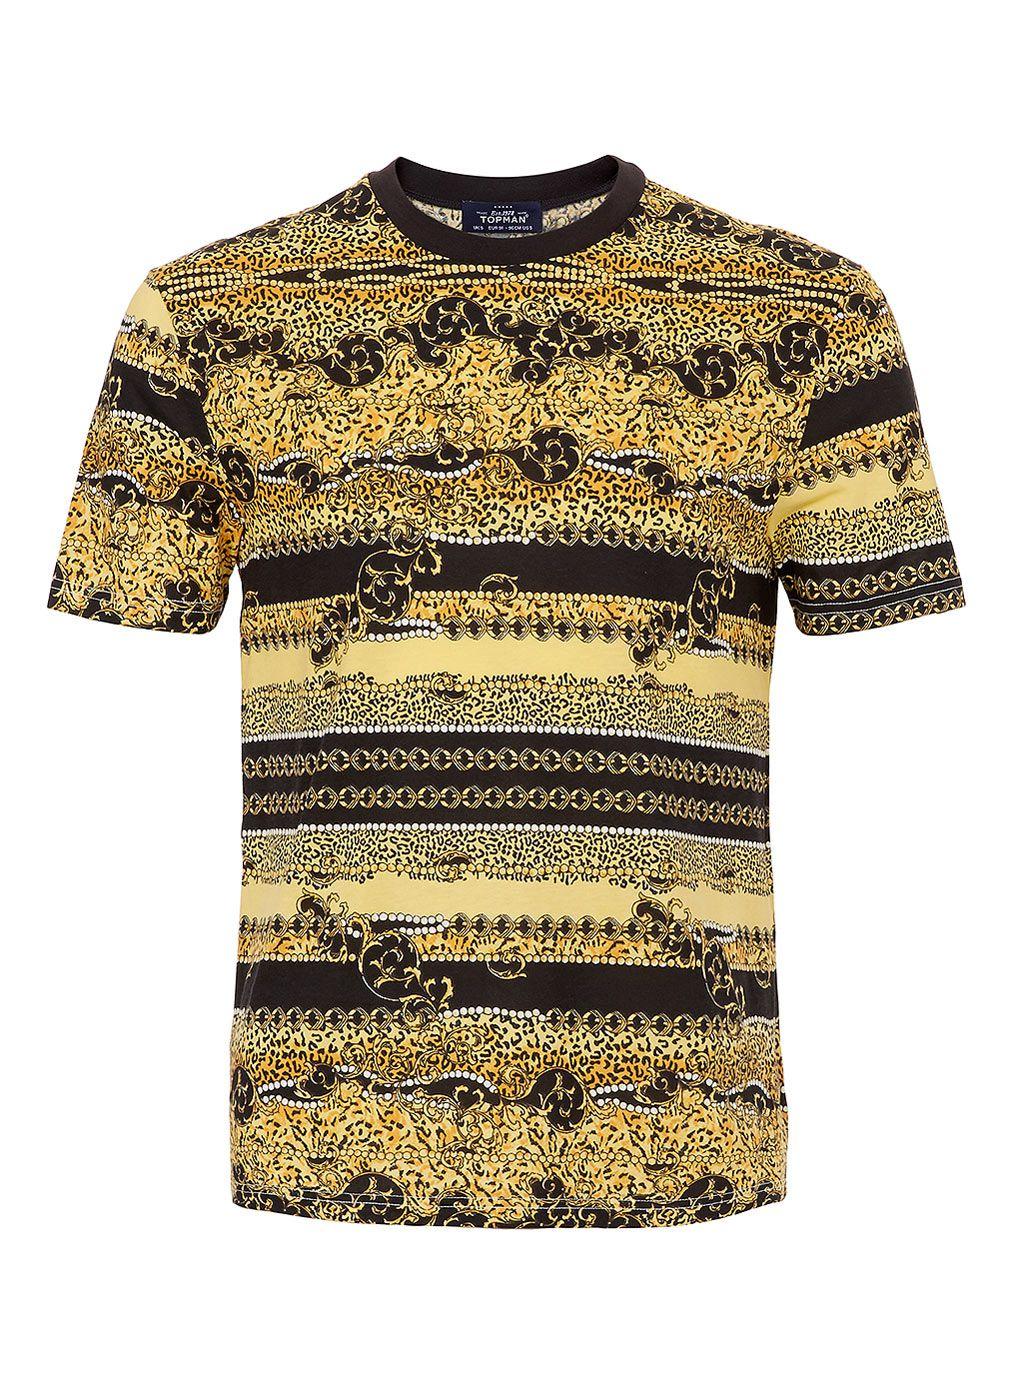 Black t shirt topman - Multi Baroque Print T Shirt Men S T Shirts Clothing Topman Usa